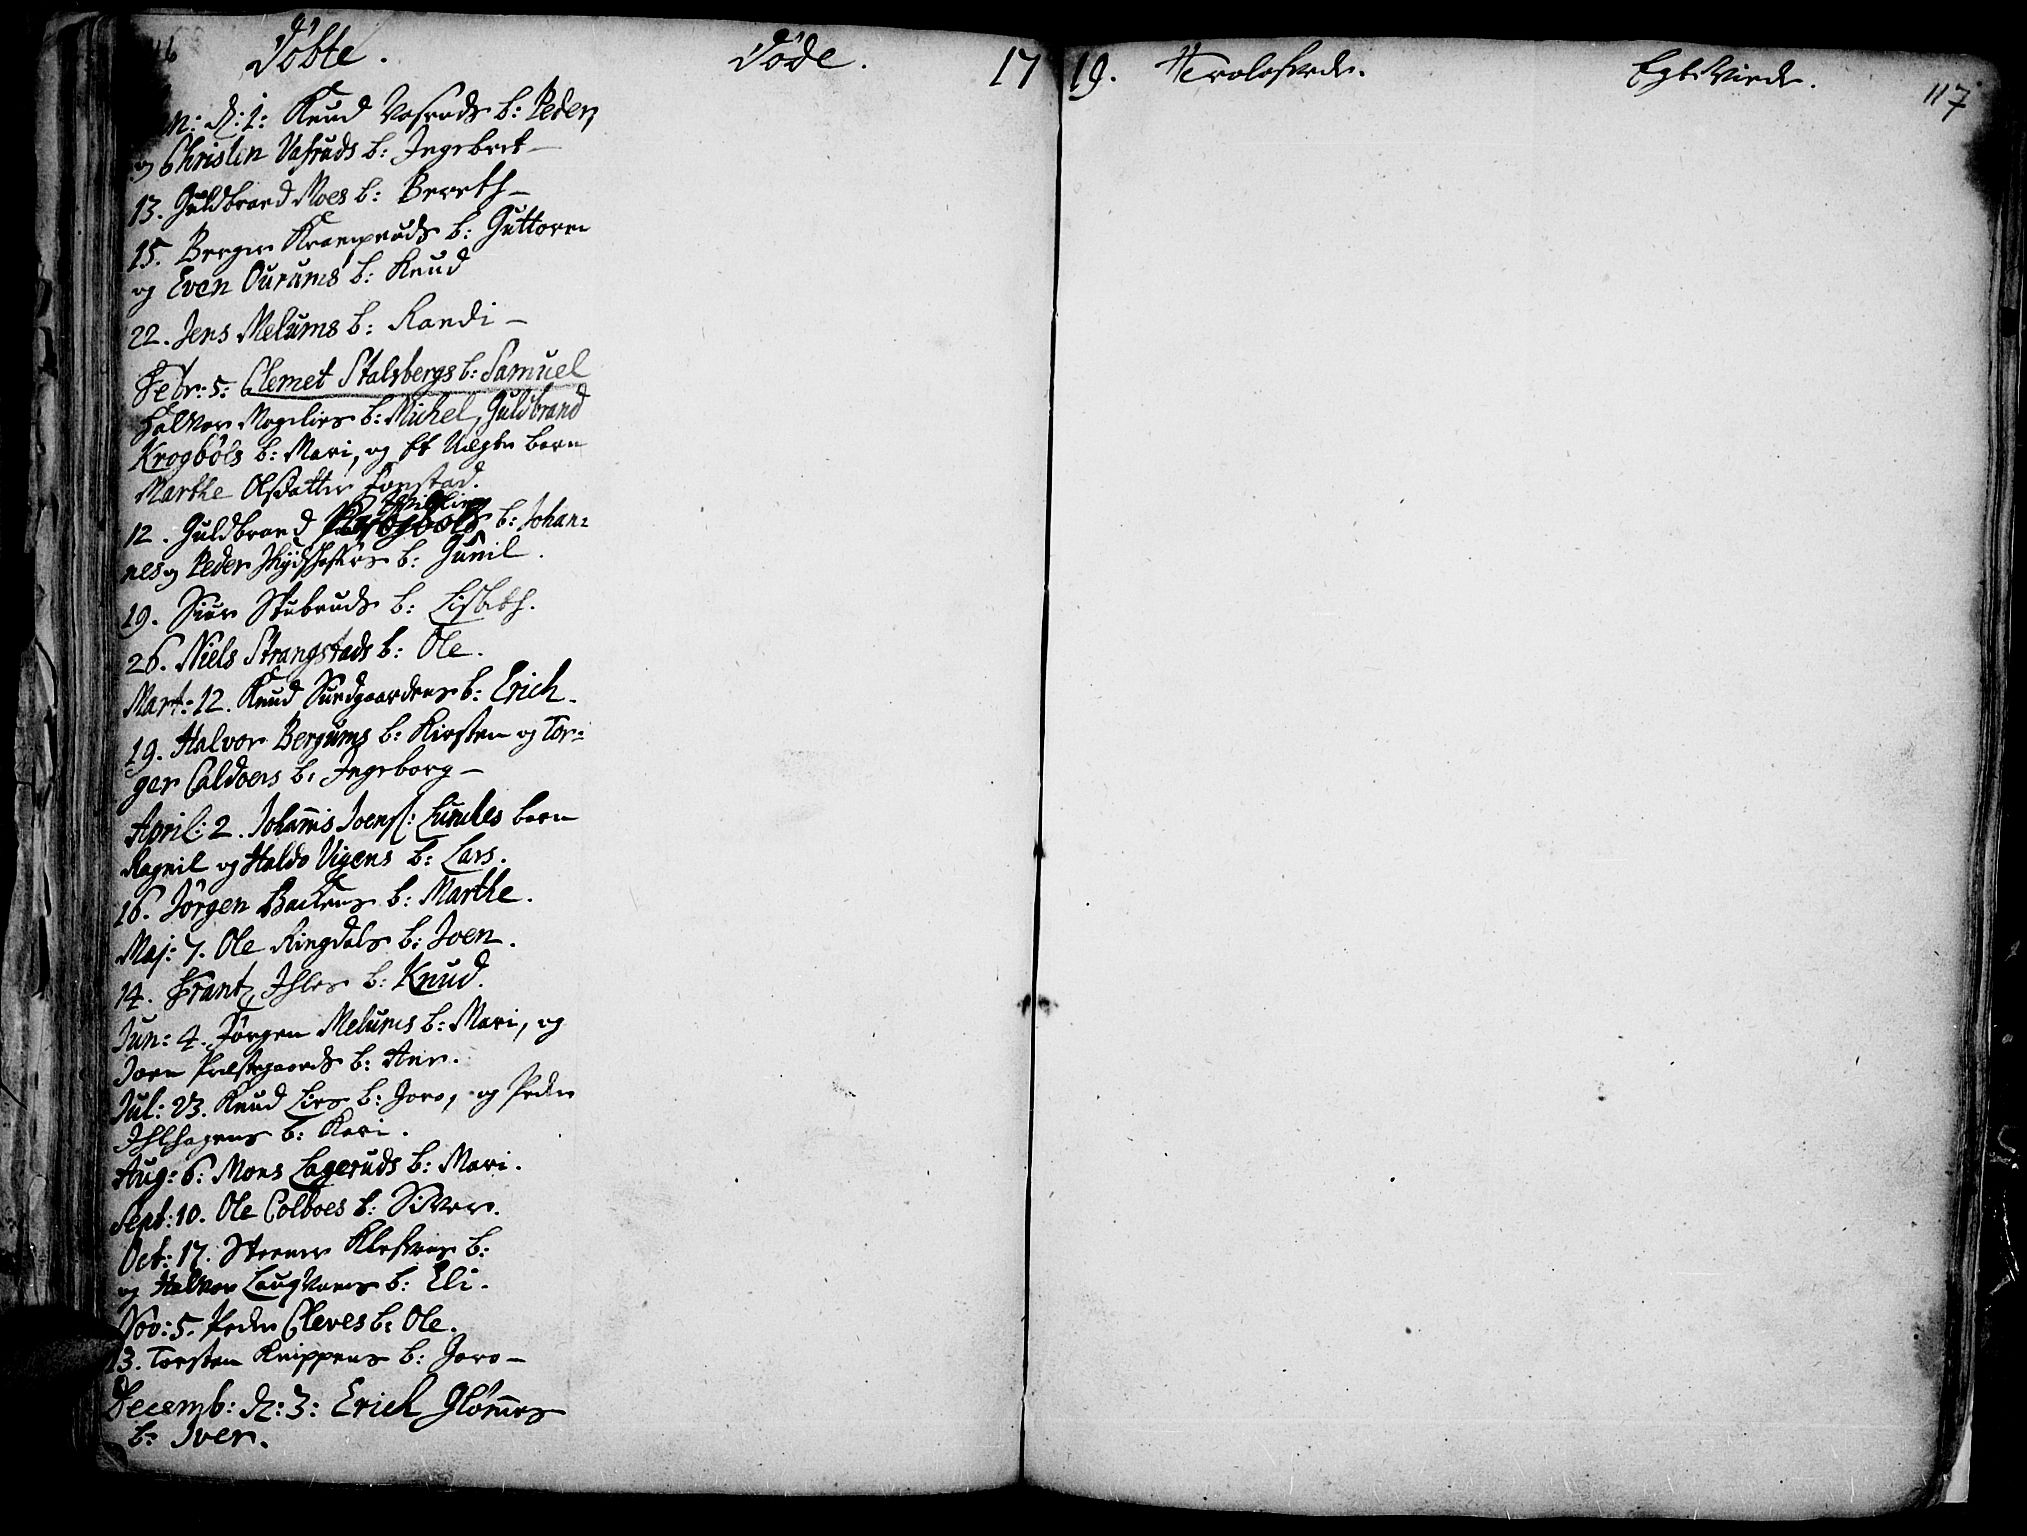 SAH, Øyer prestekontor, Ministerialbok nr. 1, 1671-1727, s. 116-117